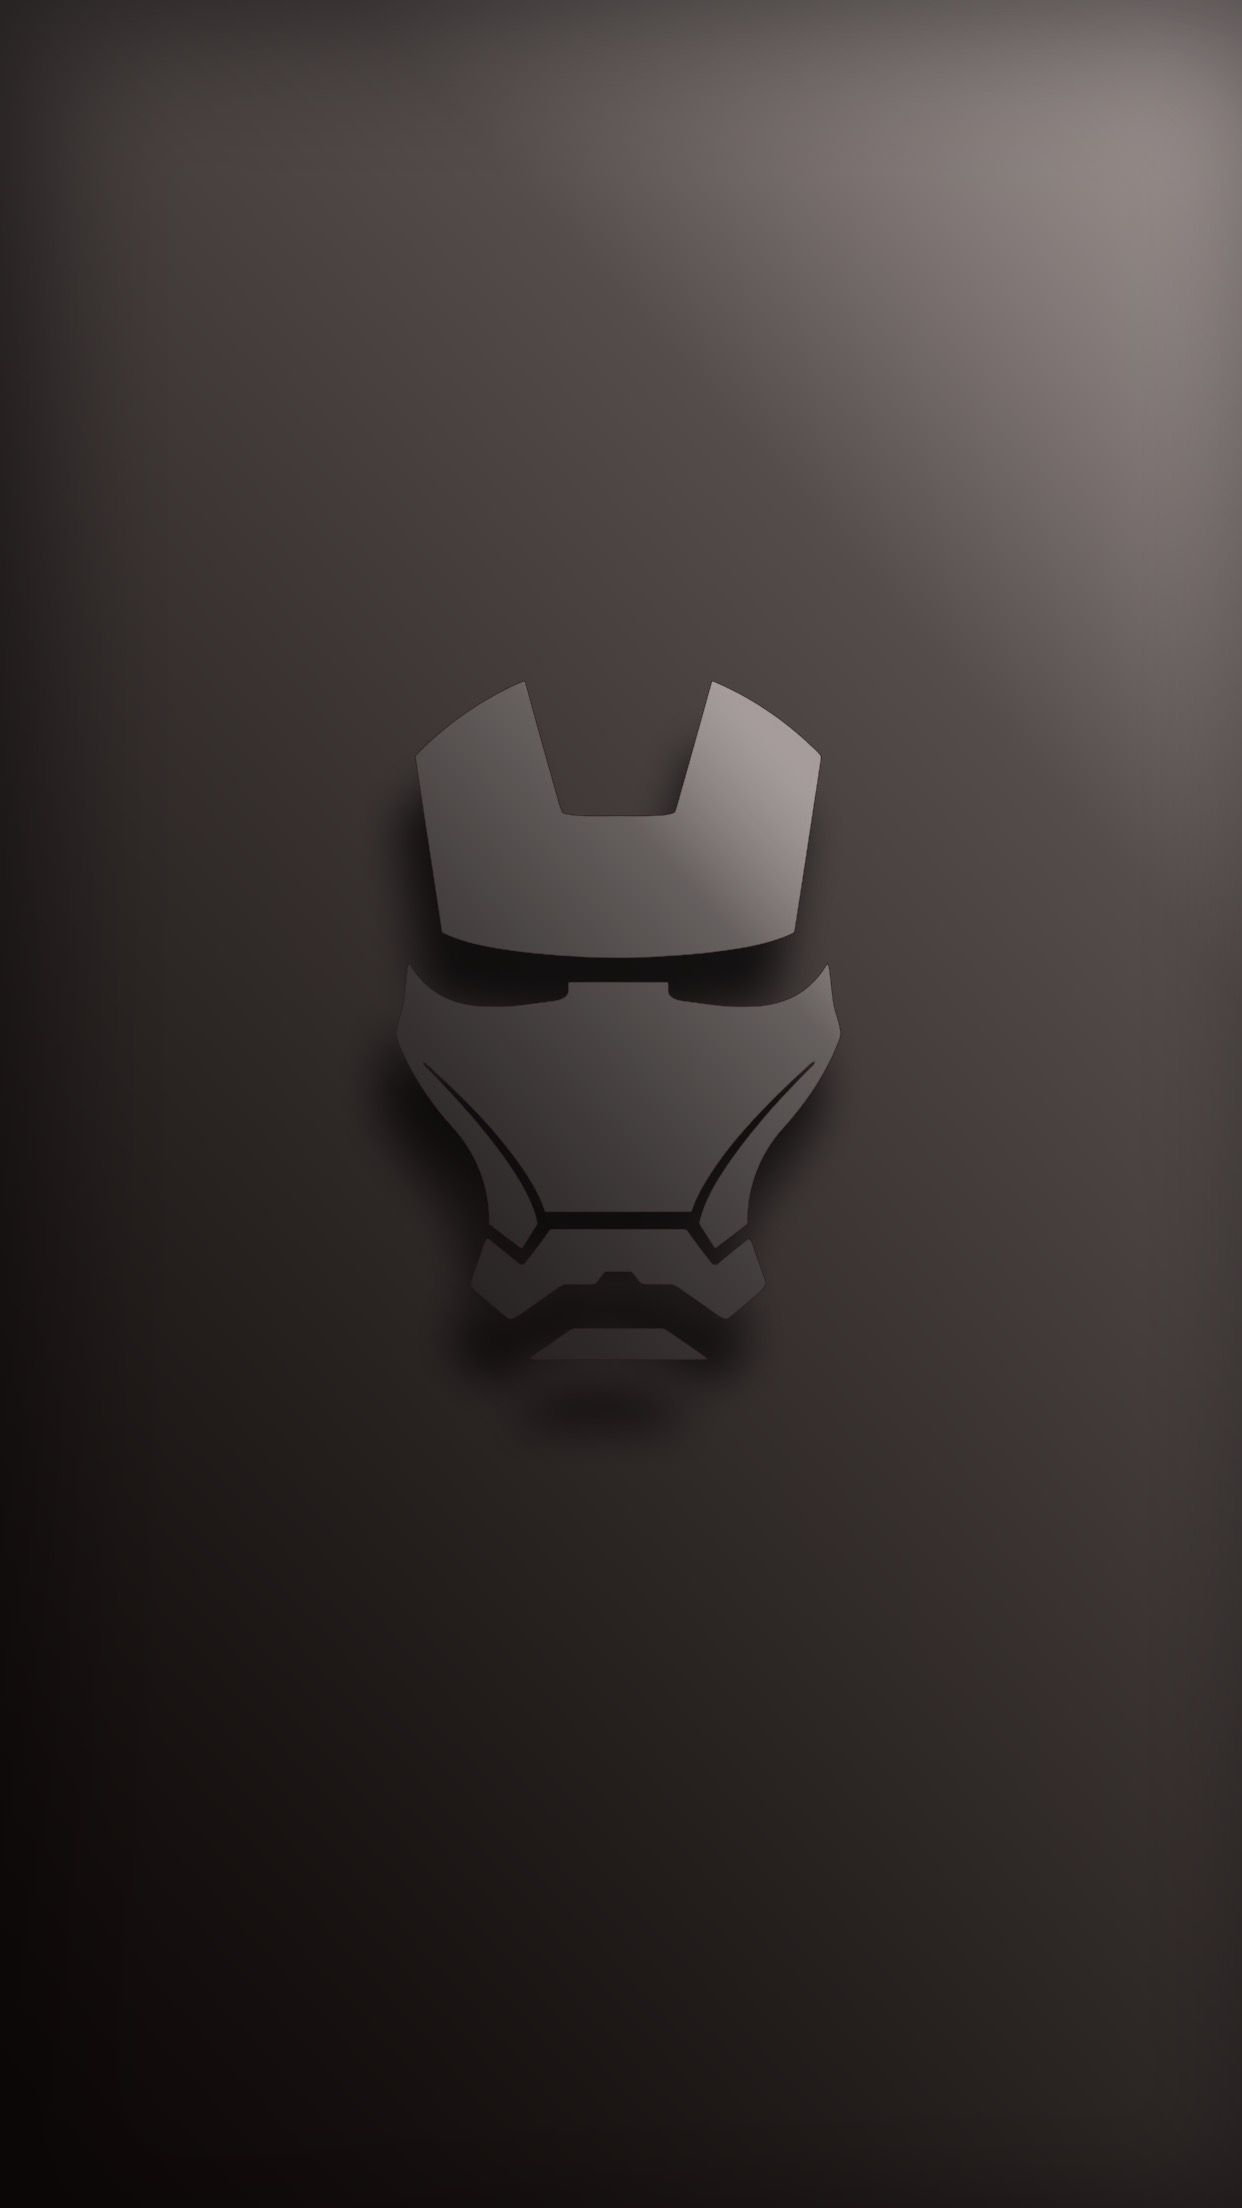 The Power Of Iron Man Iron Man Wallpaper Iron Man Art Man